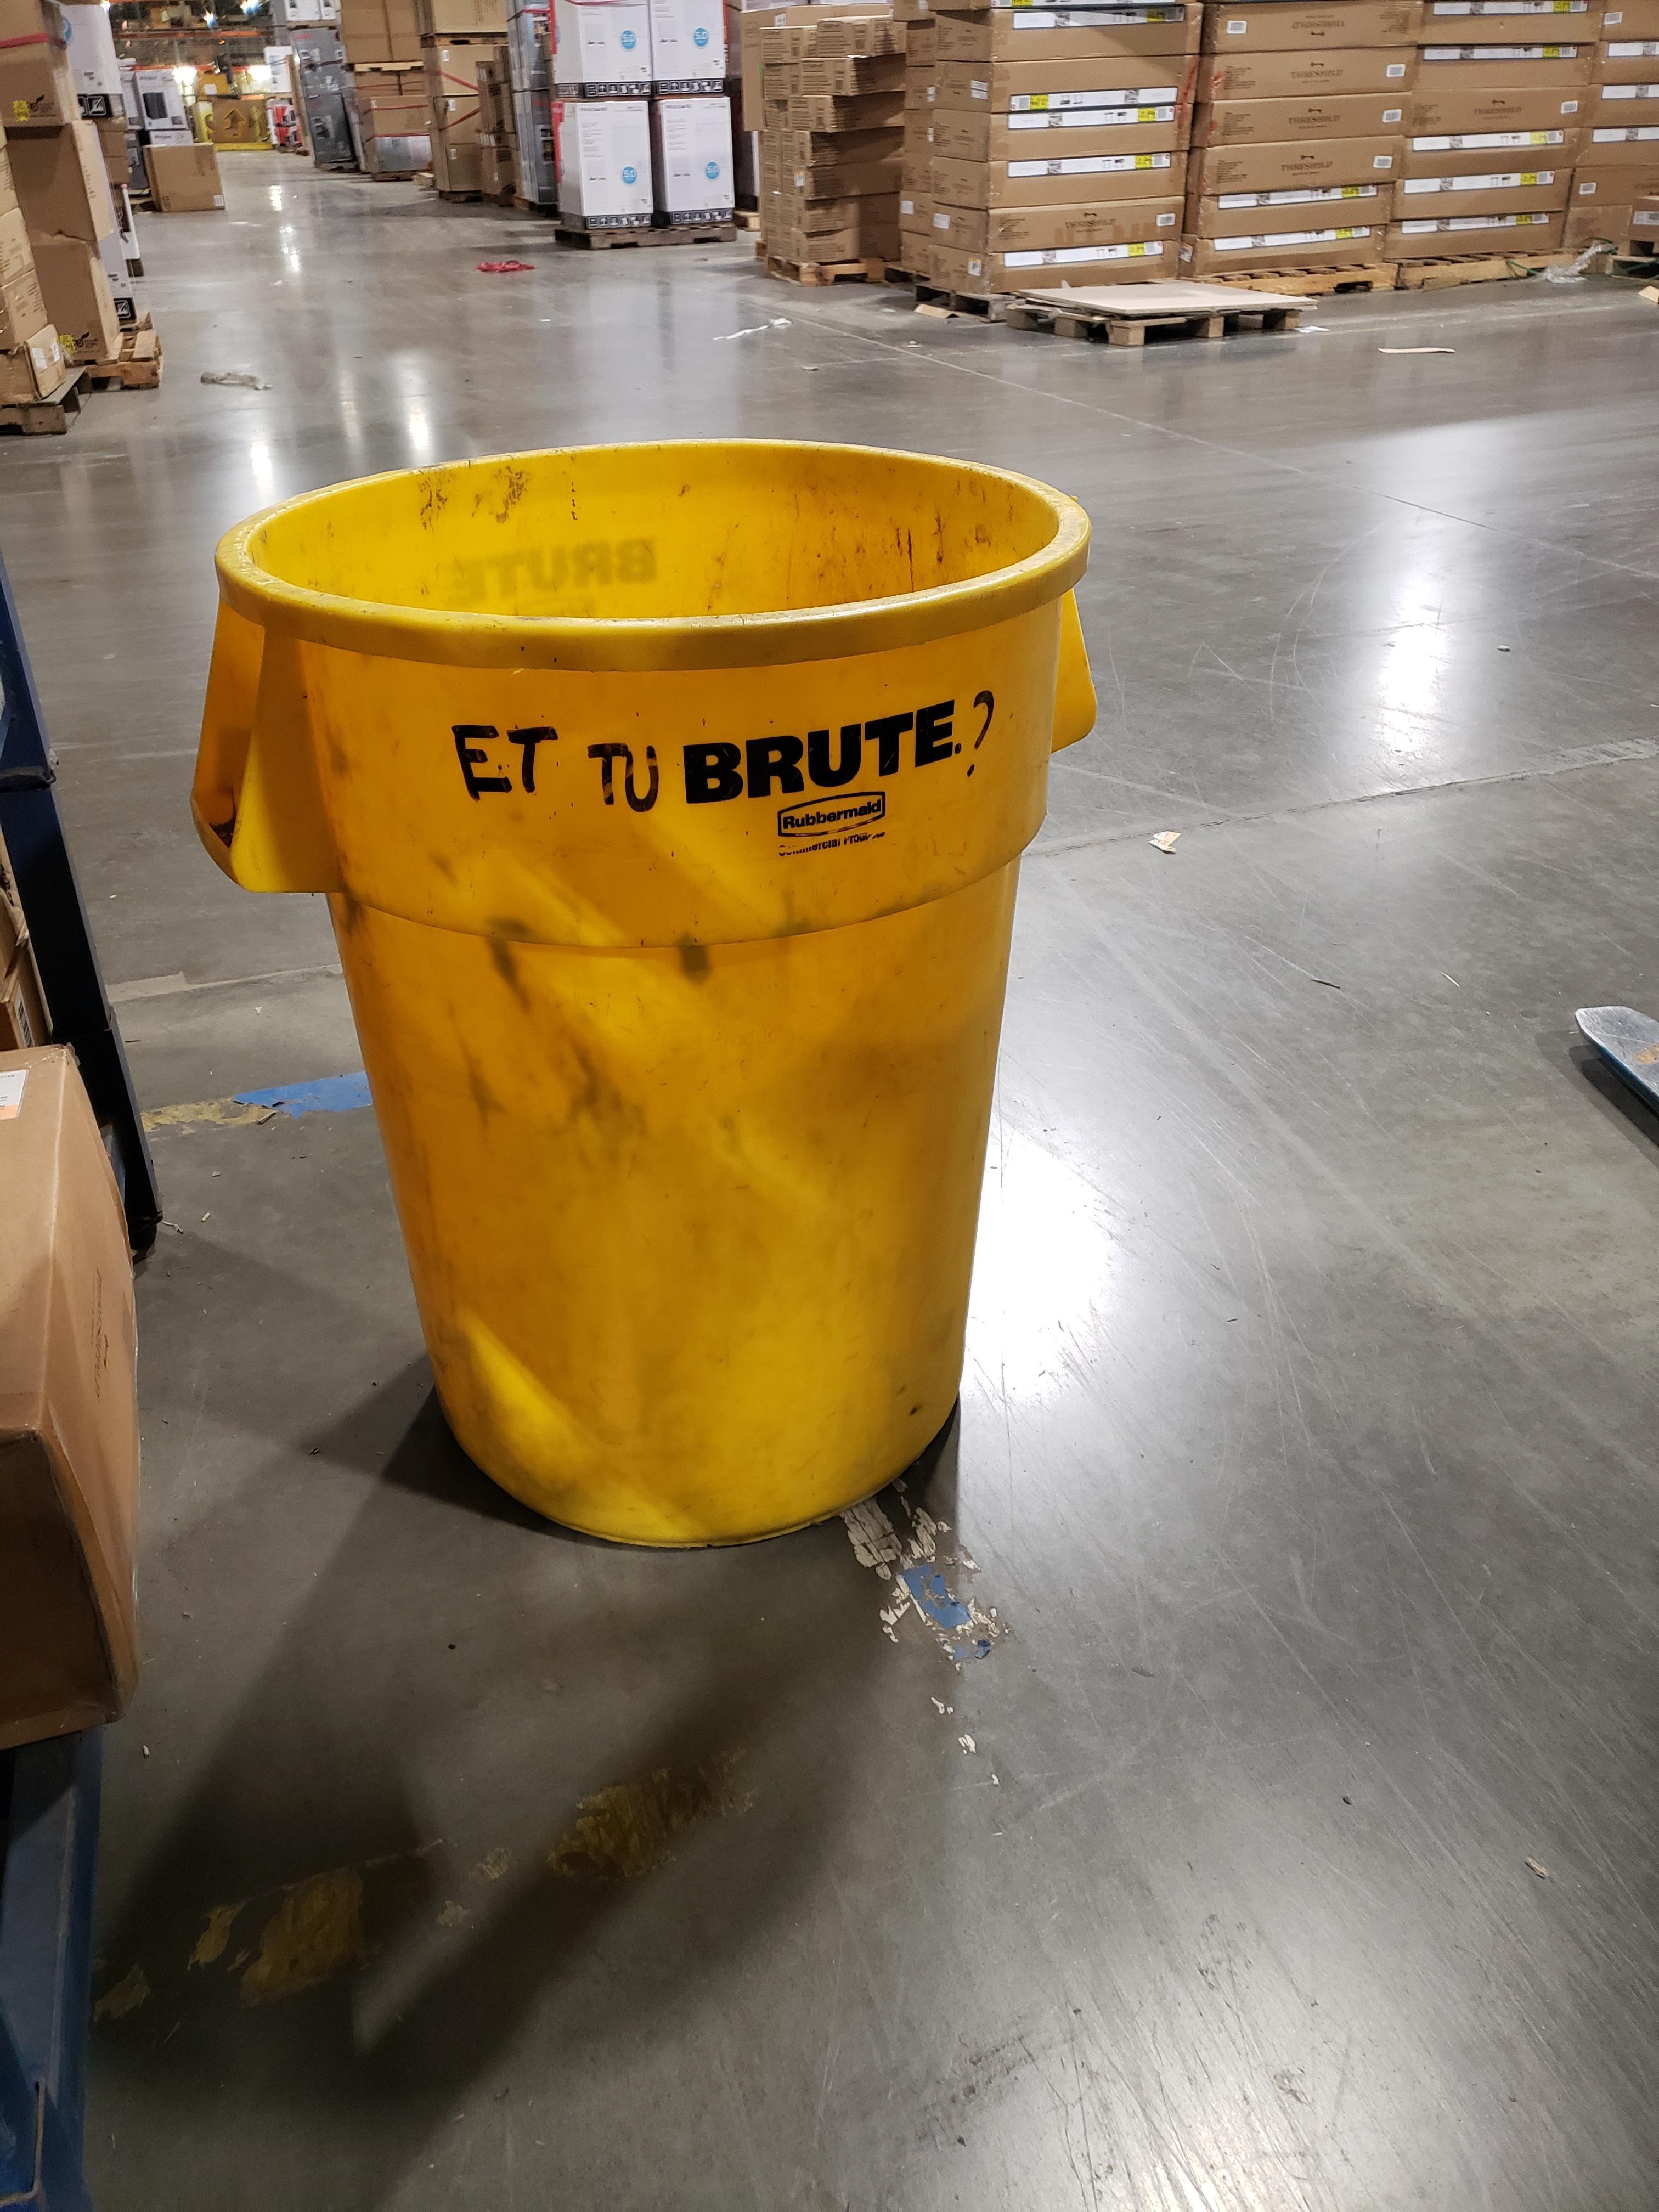 Someone at work has a good sense of humor lol.